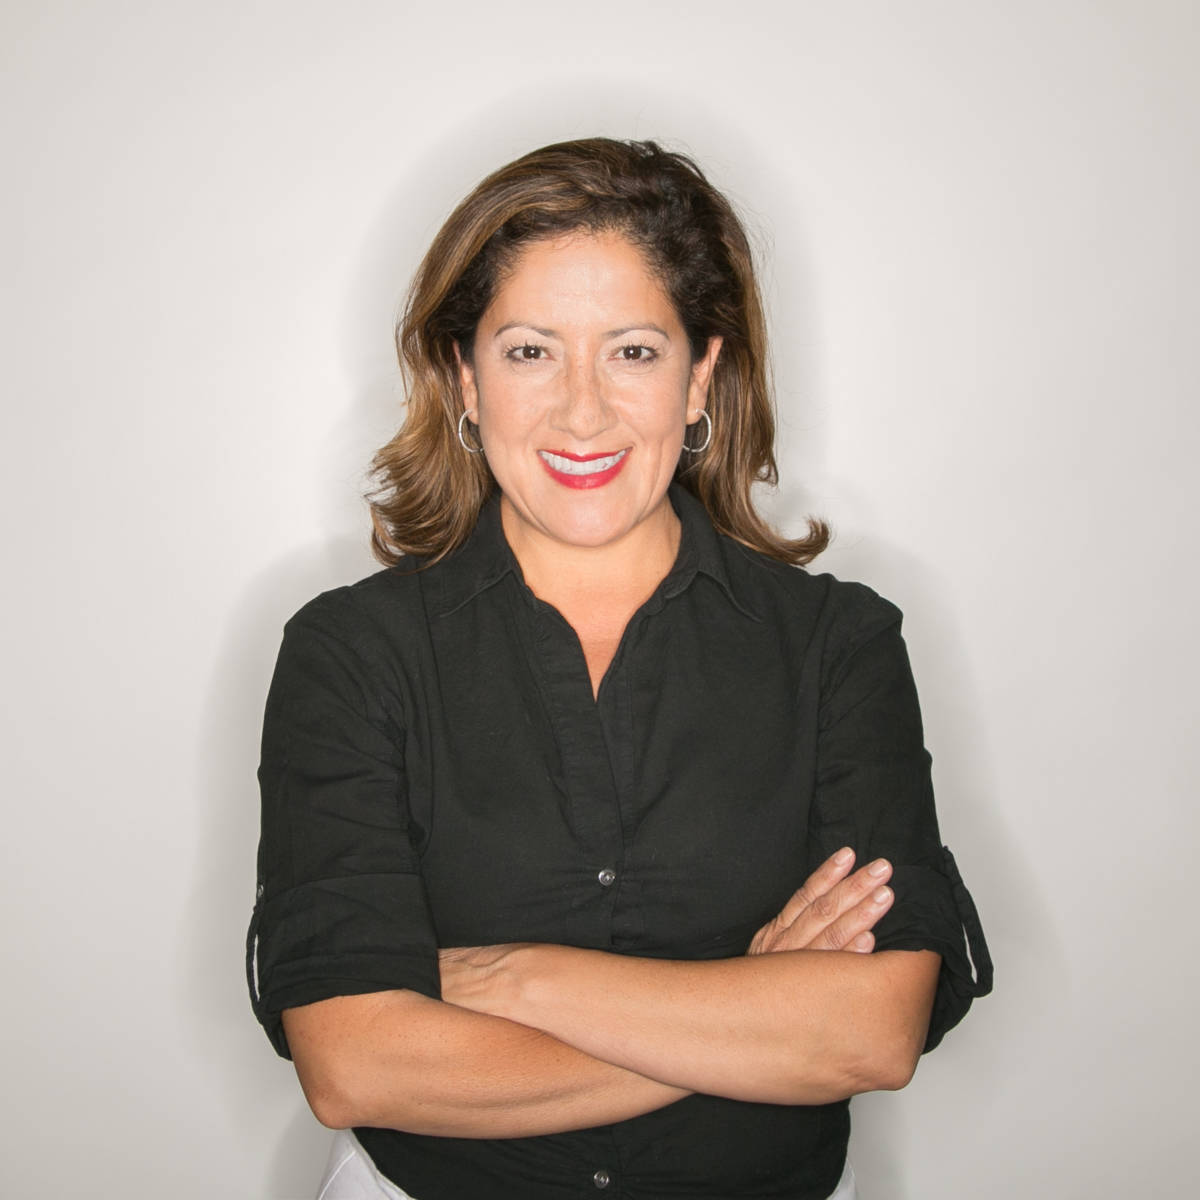 Yvonne Jacobs